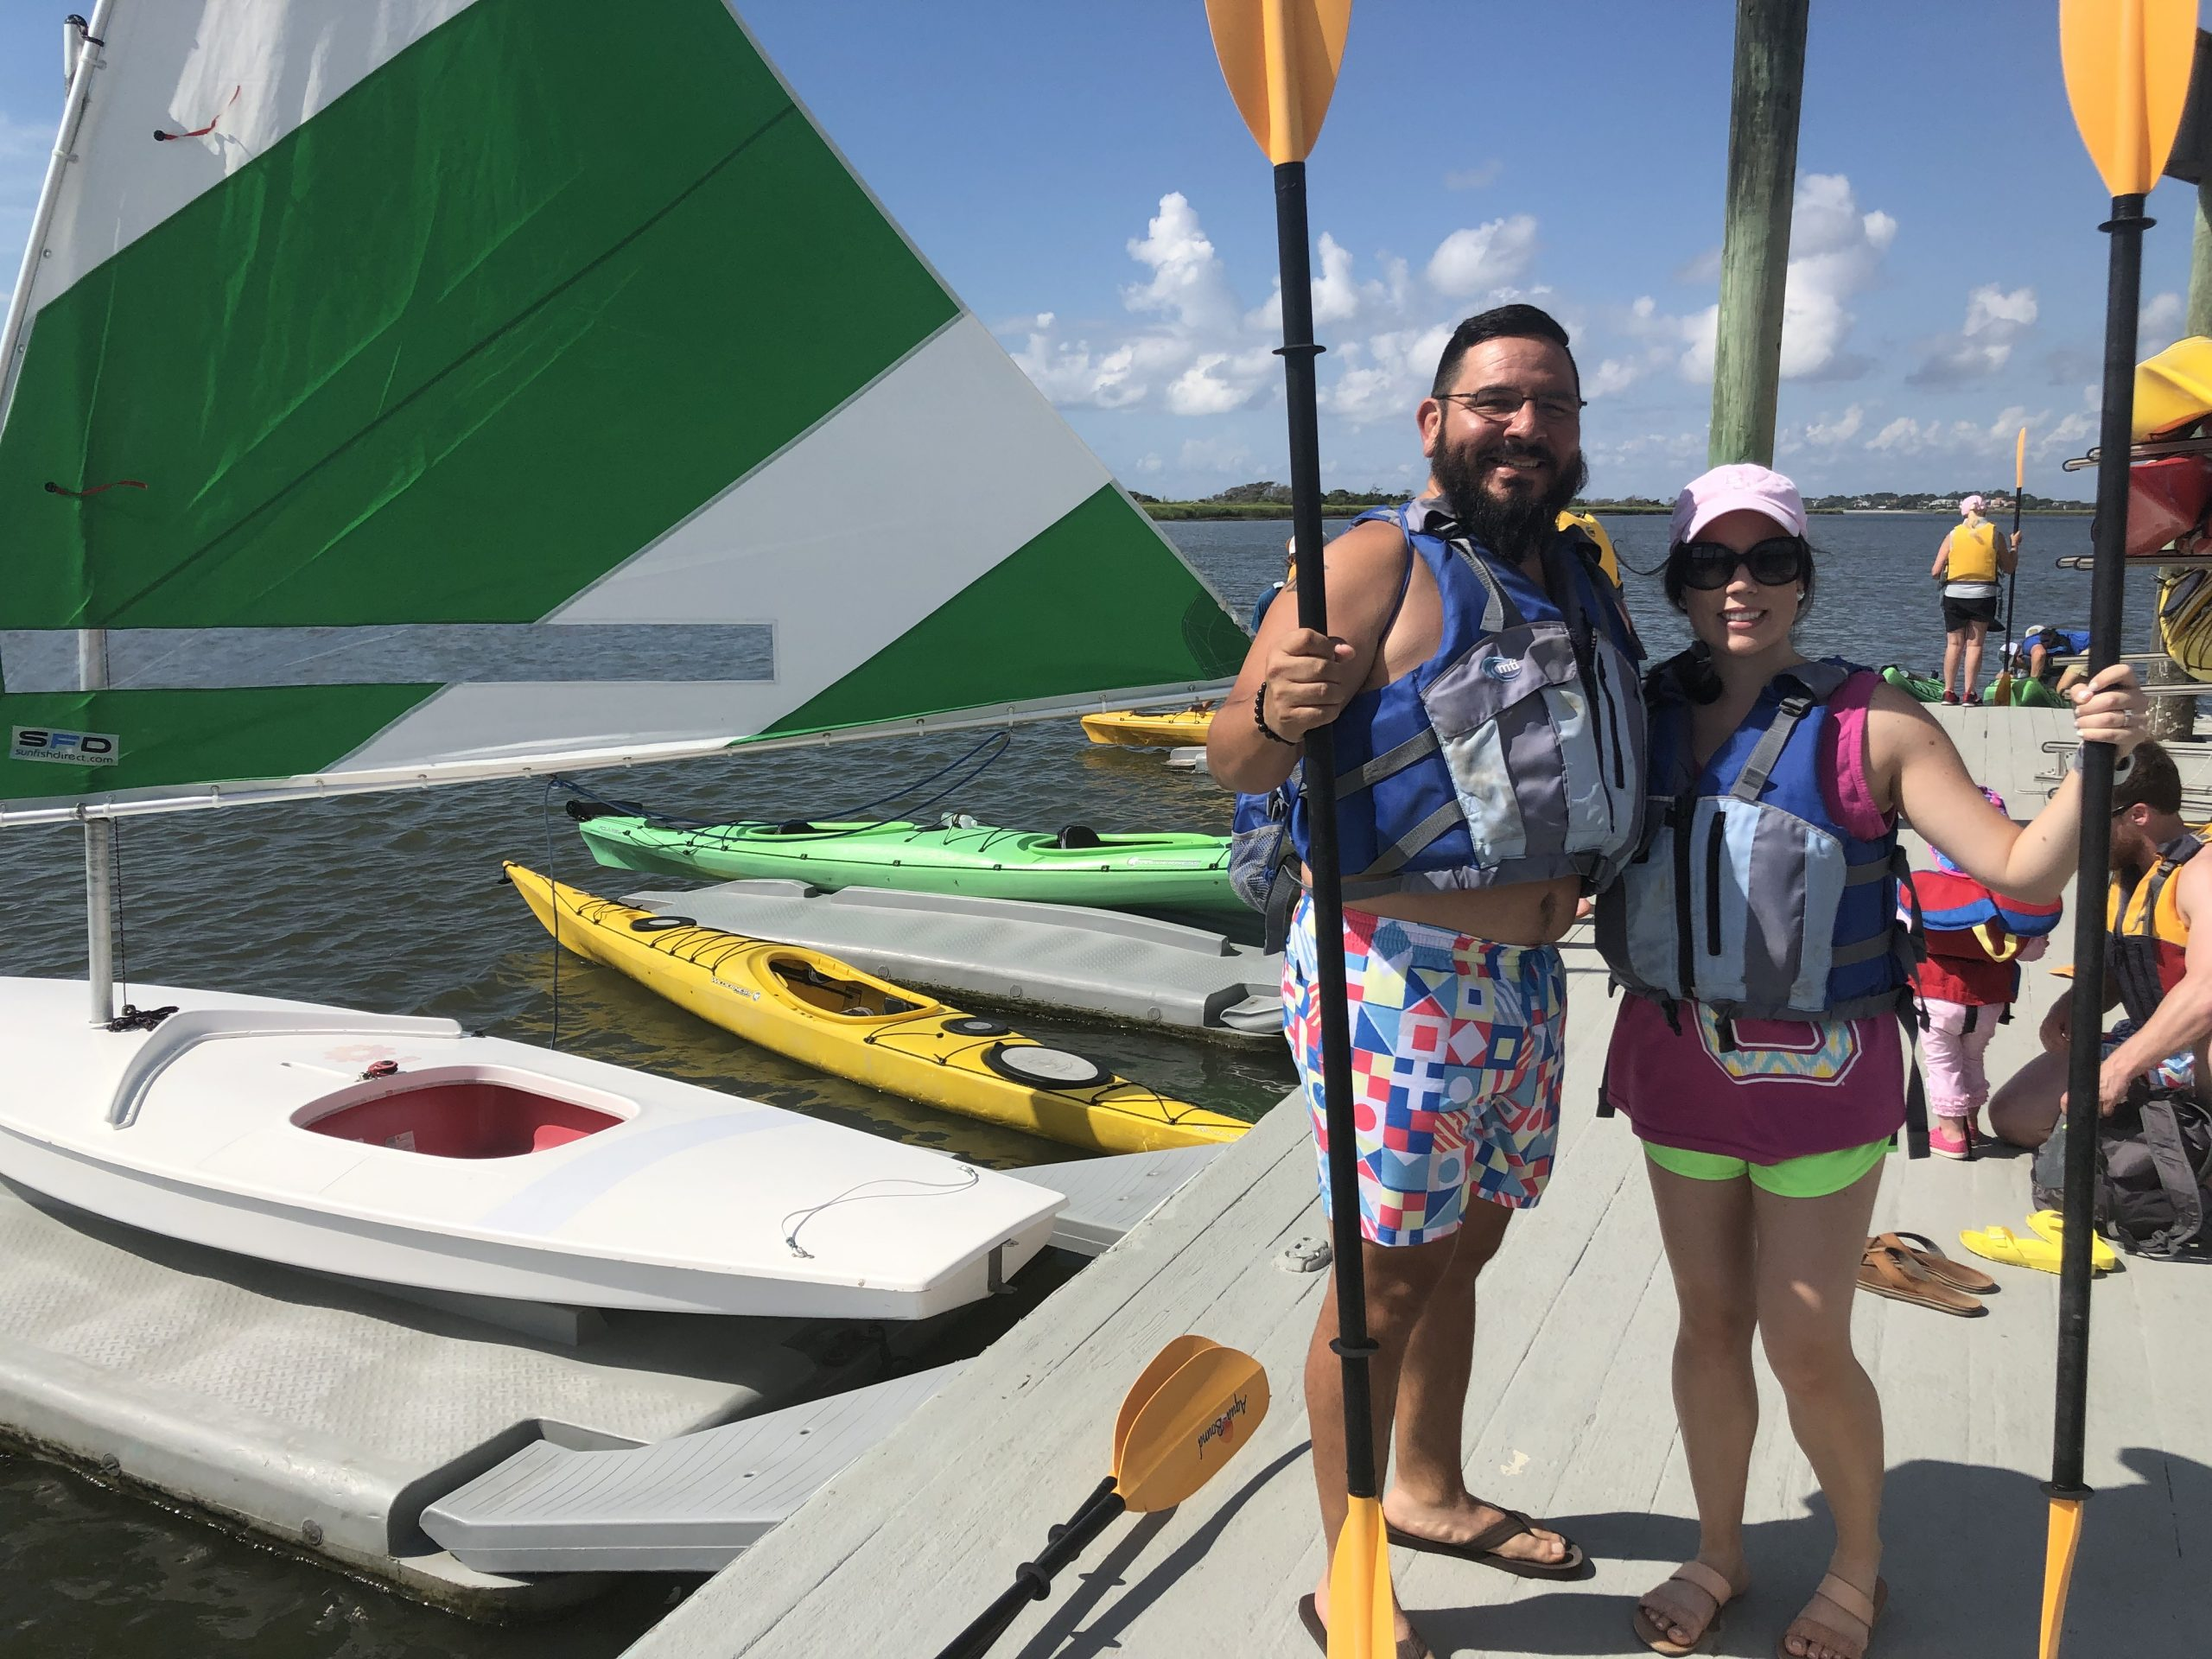 Sea island | kayaking